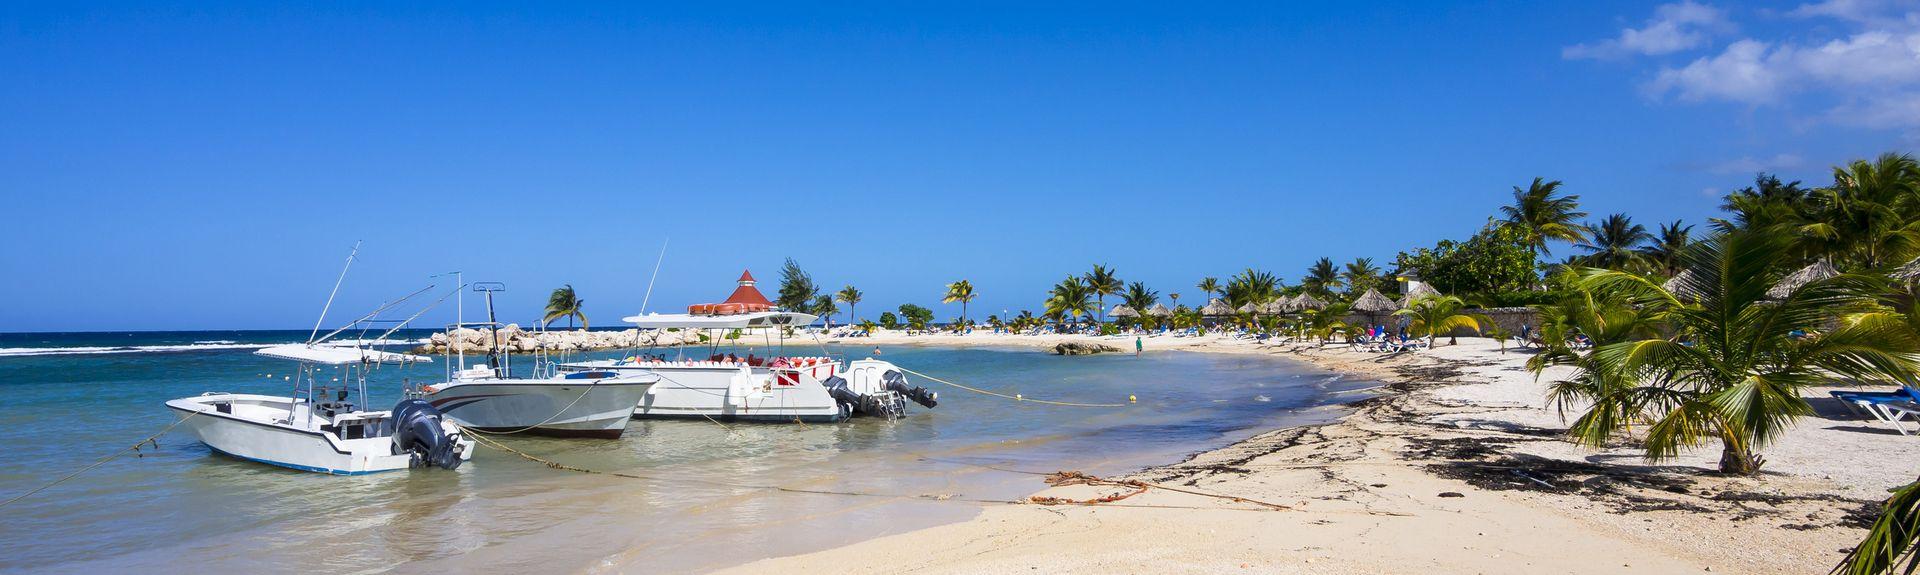 Runaway Bay, Saint Ann, Jamaica